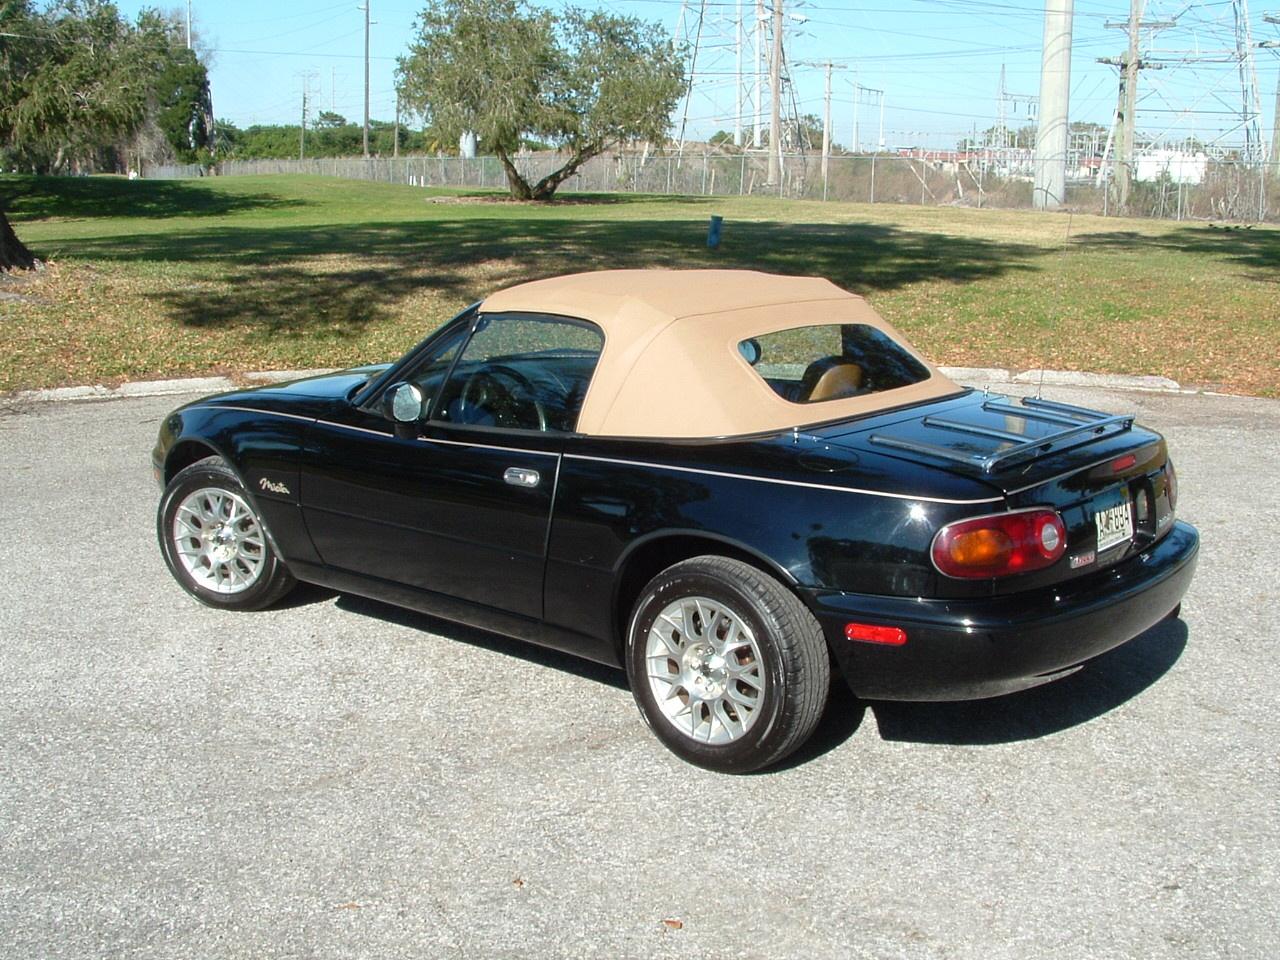 service manual  car engine manuals 1996 mazda miata mx 5 1998 Mazda Miata 1995 Mazda Miata